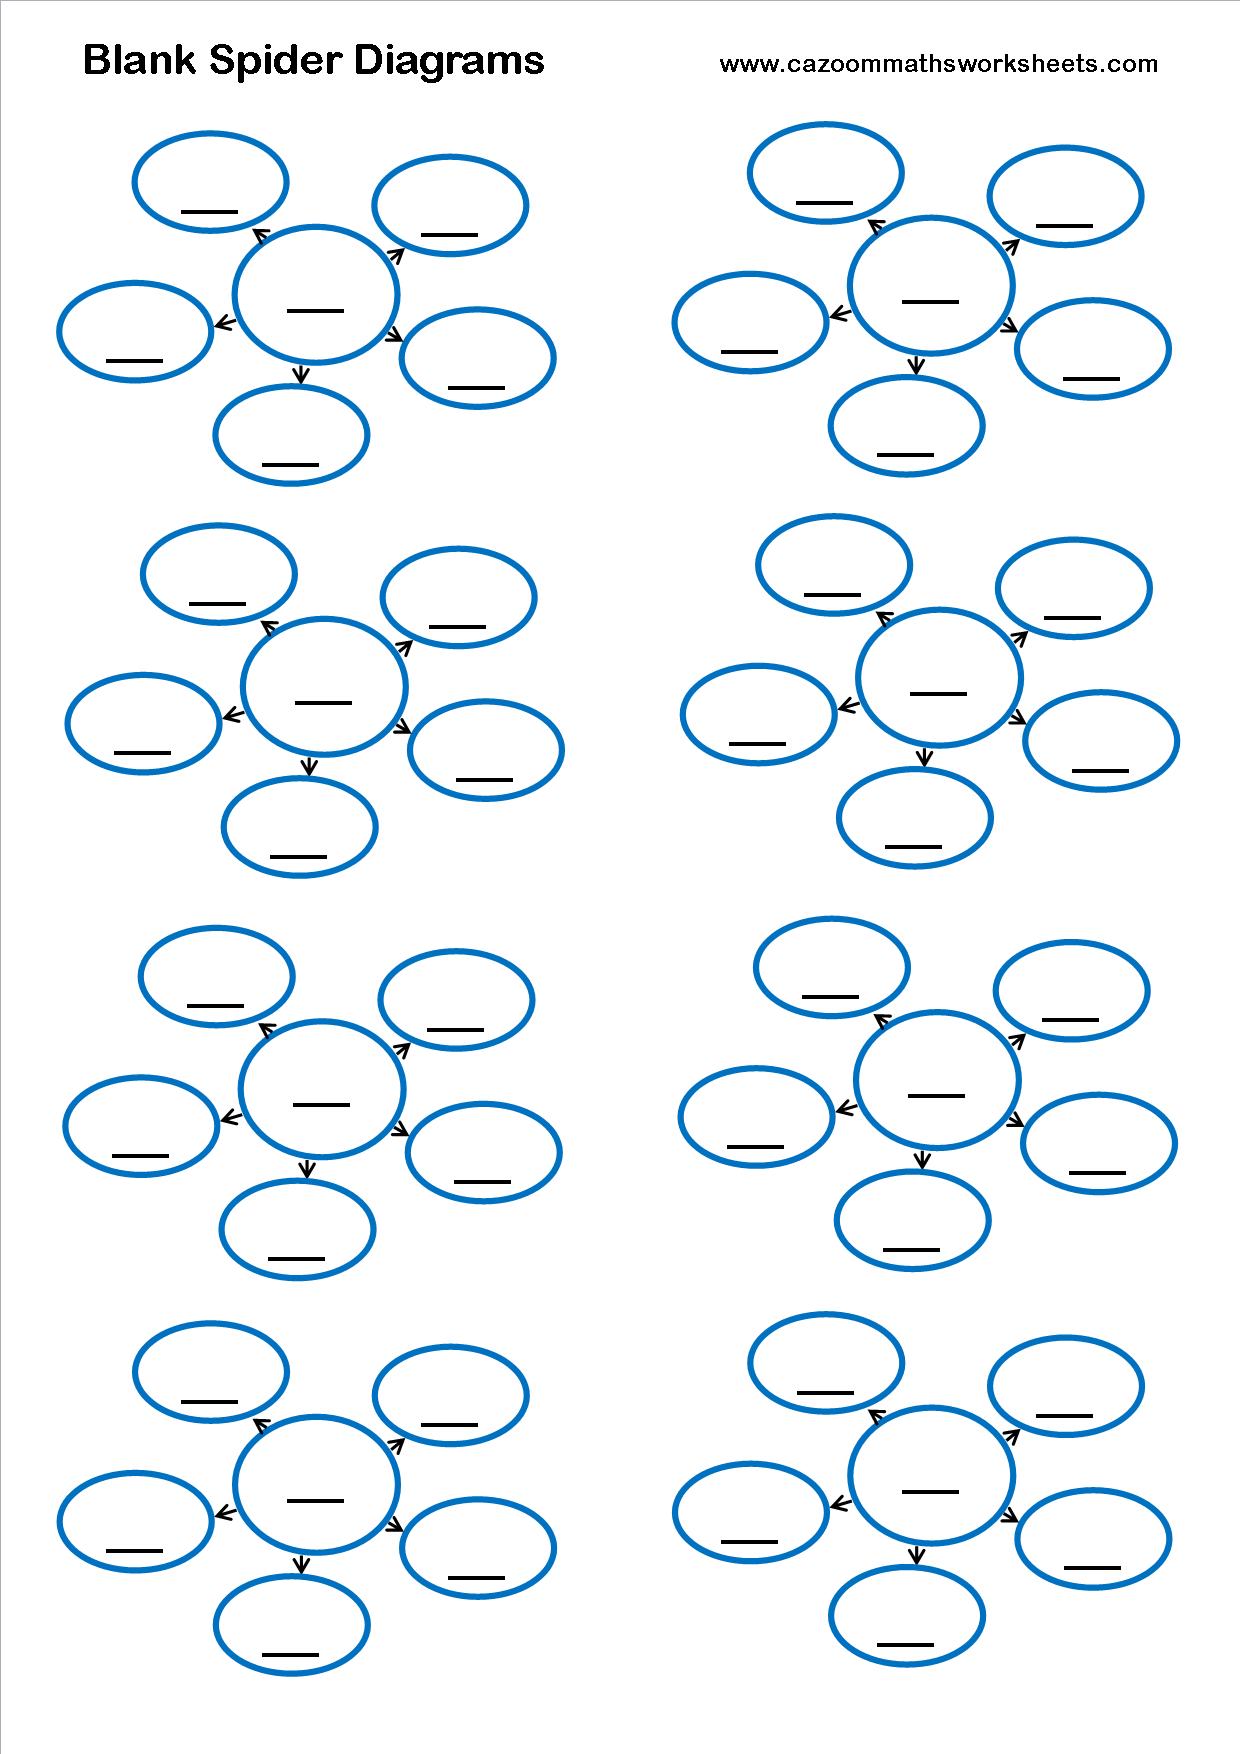 Free Mathsteaching Resources